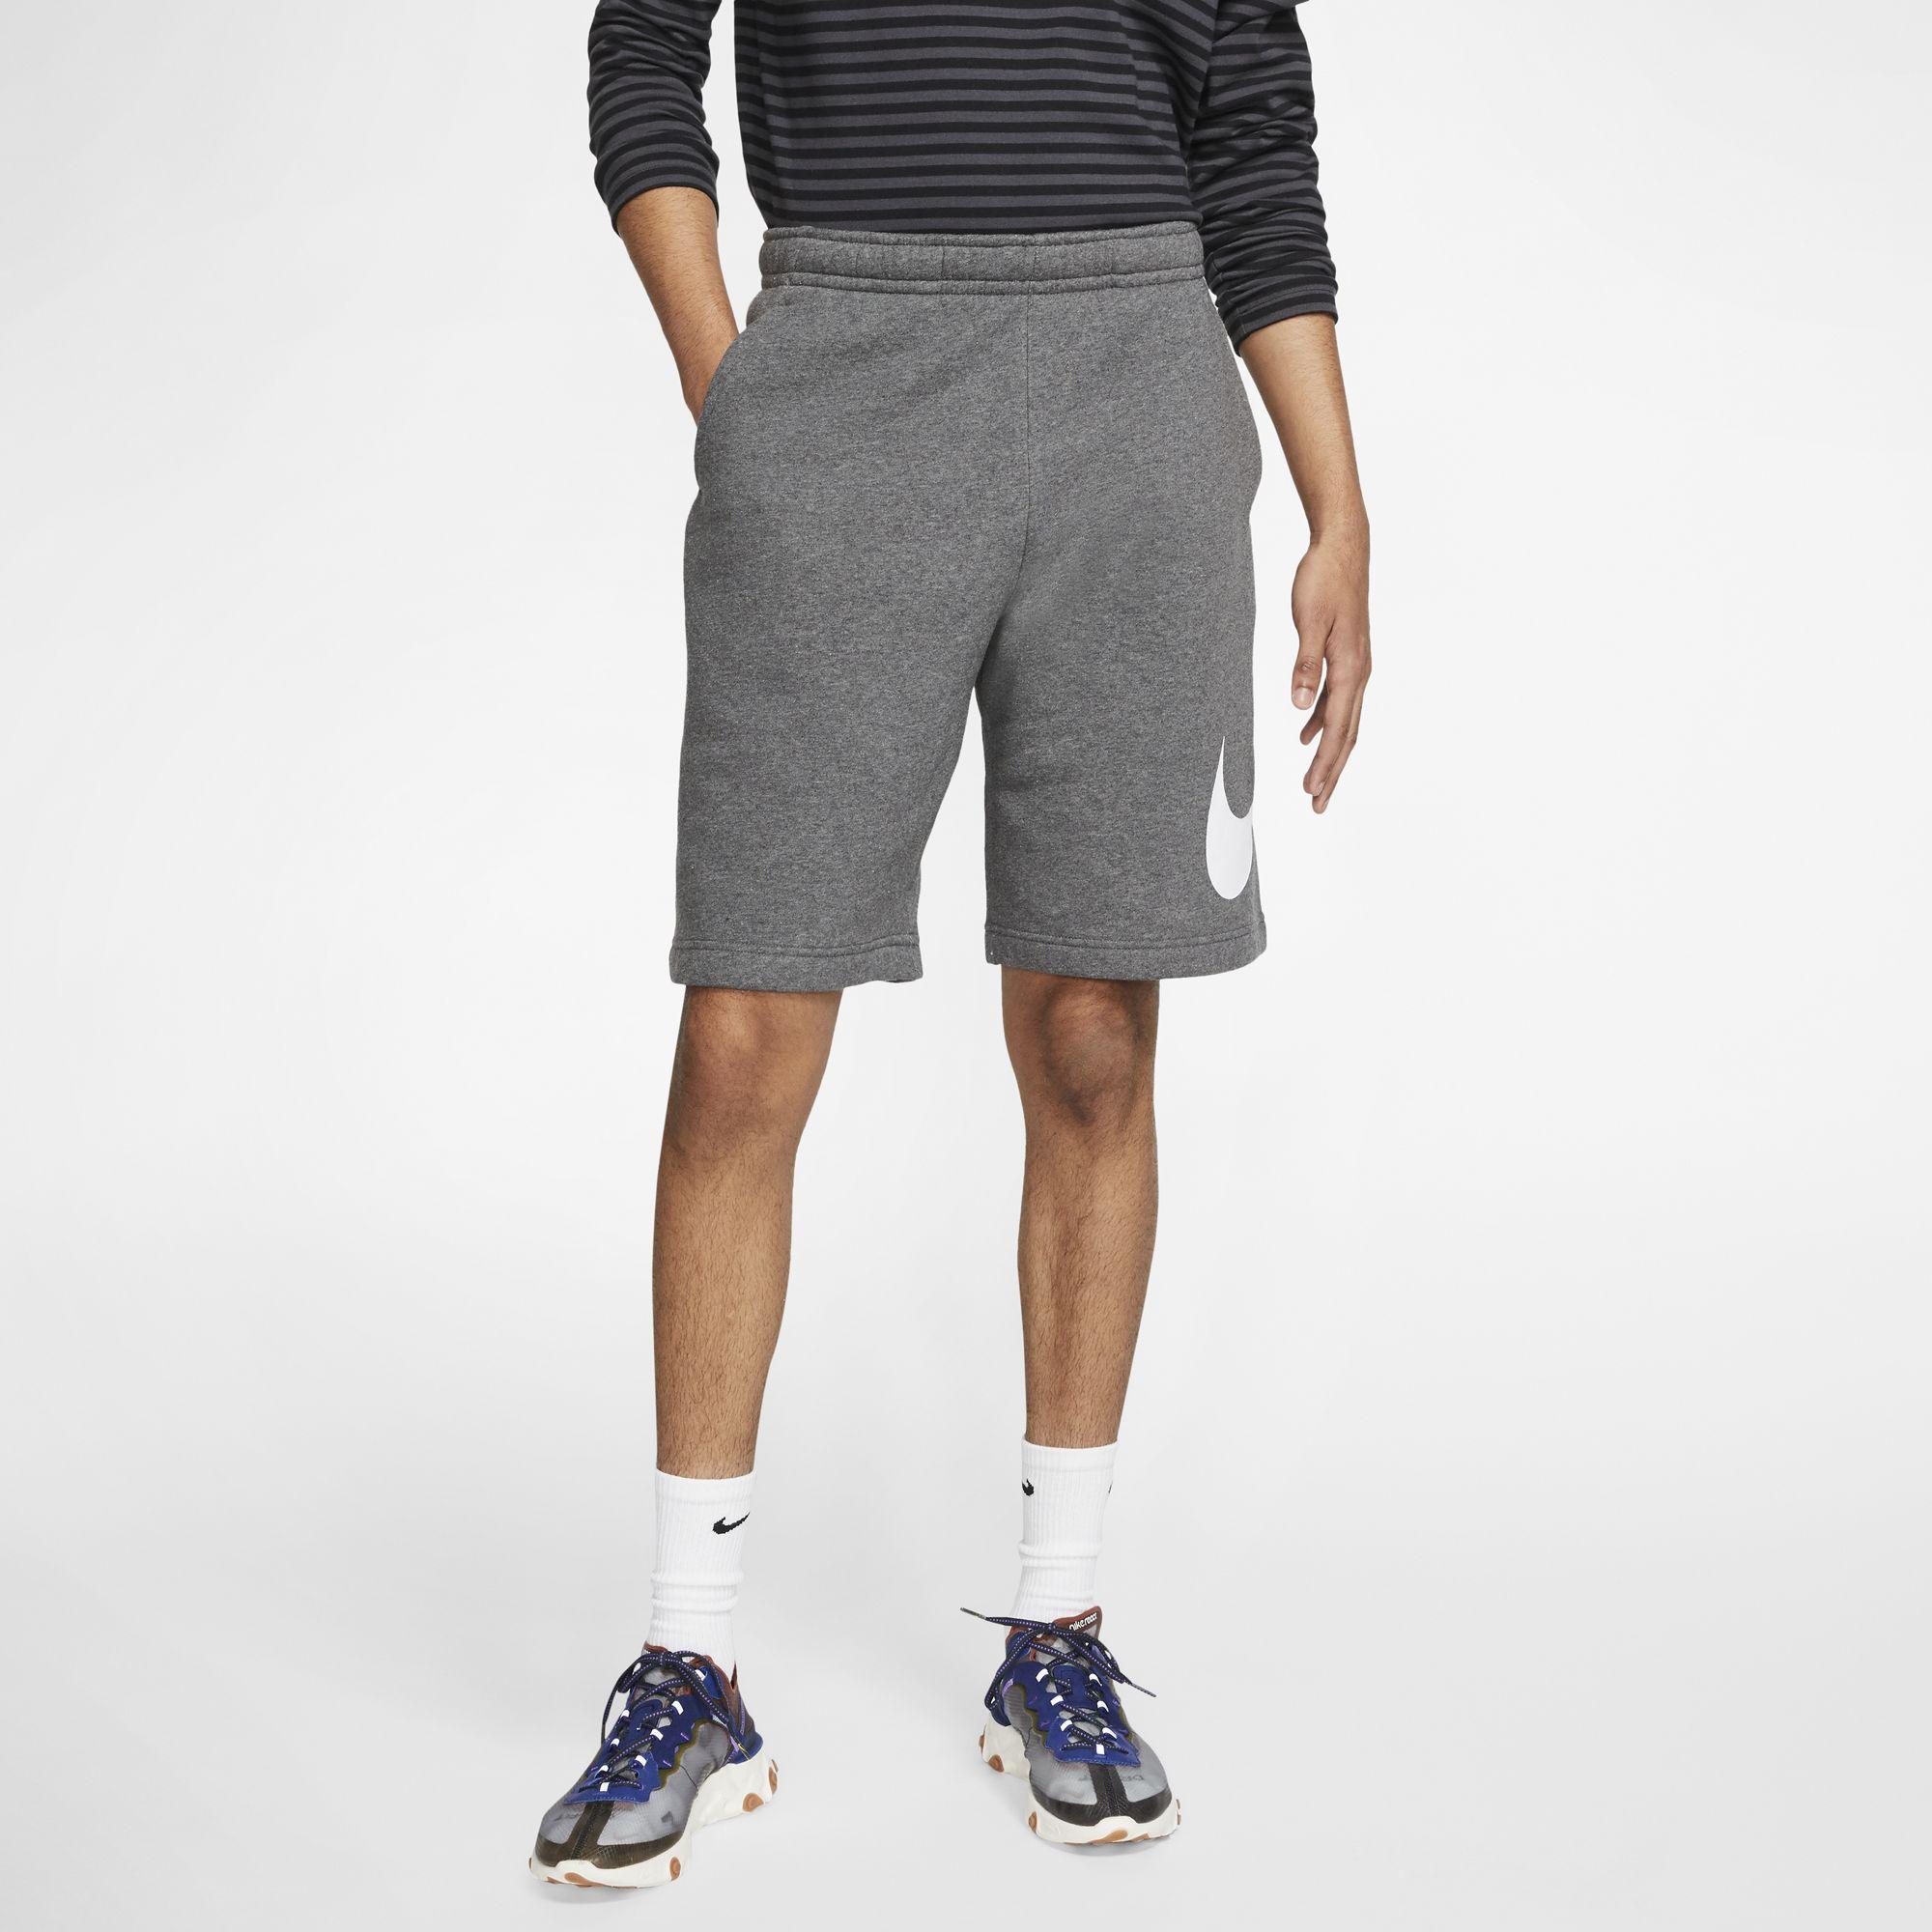 Men's Sportwear Club Graphic Shorts, Charcoal,Smoke,Steel, swatch